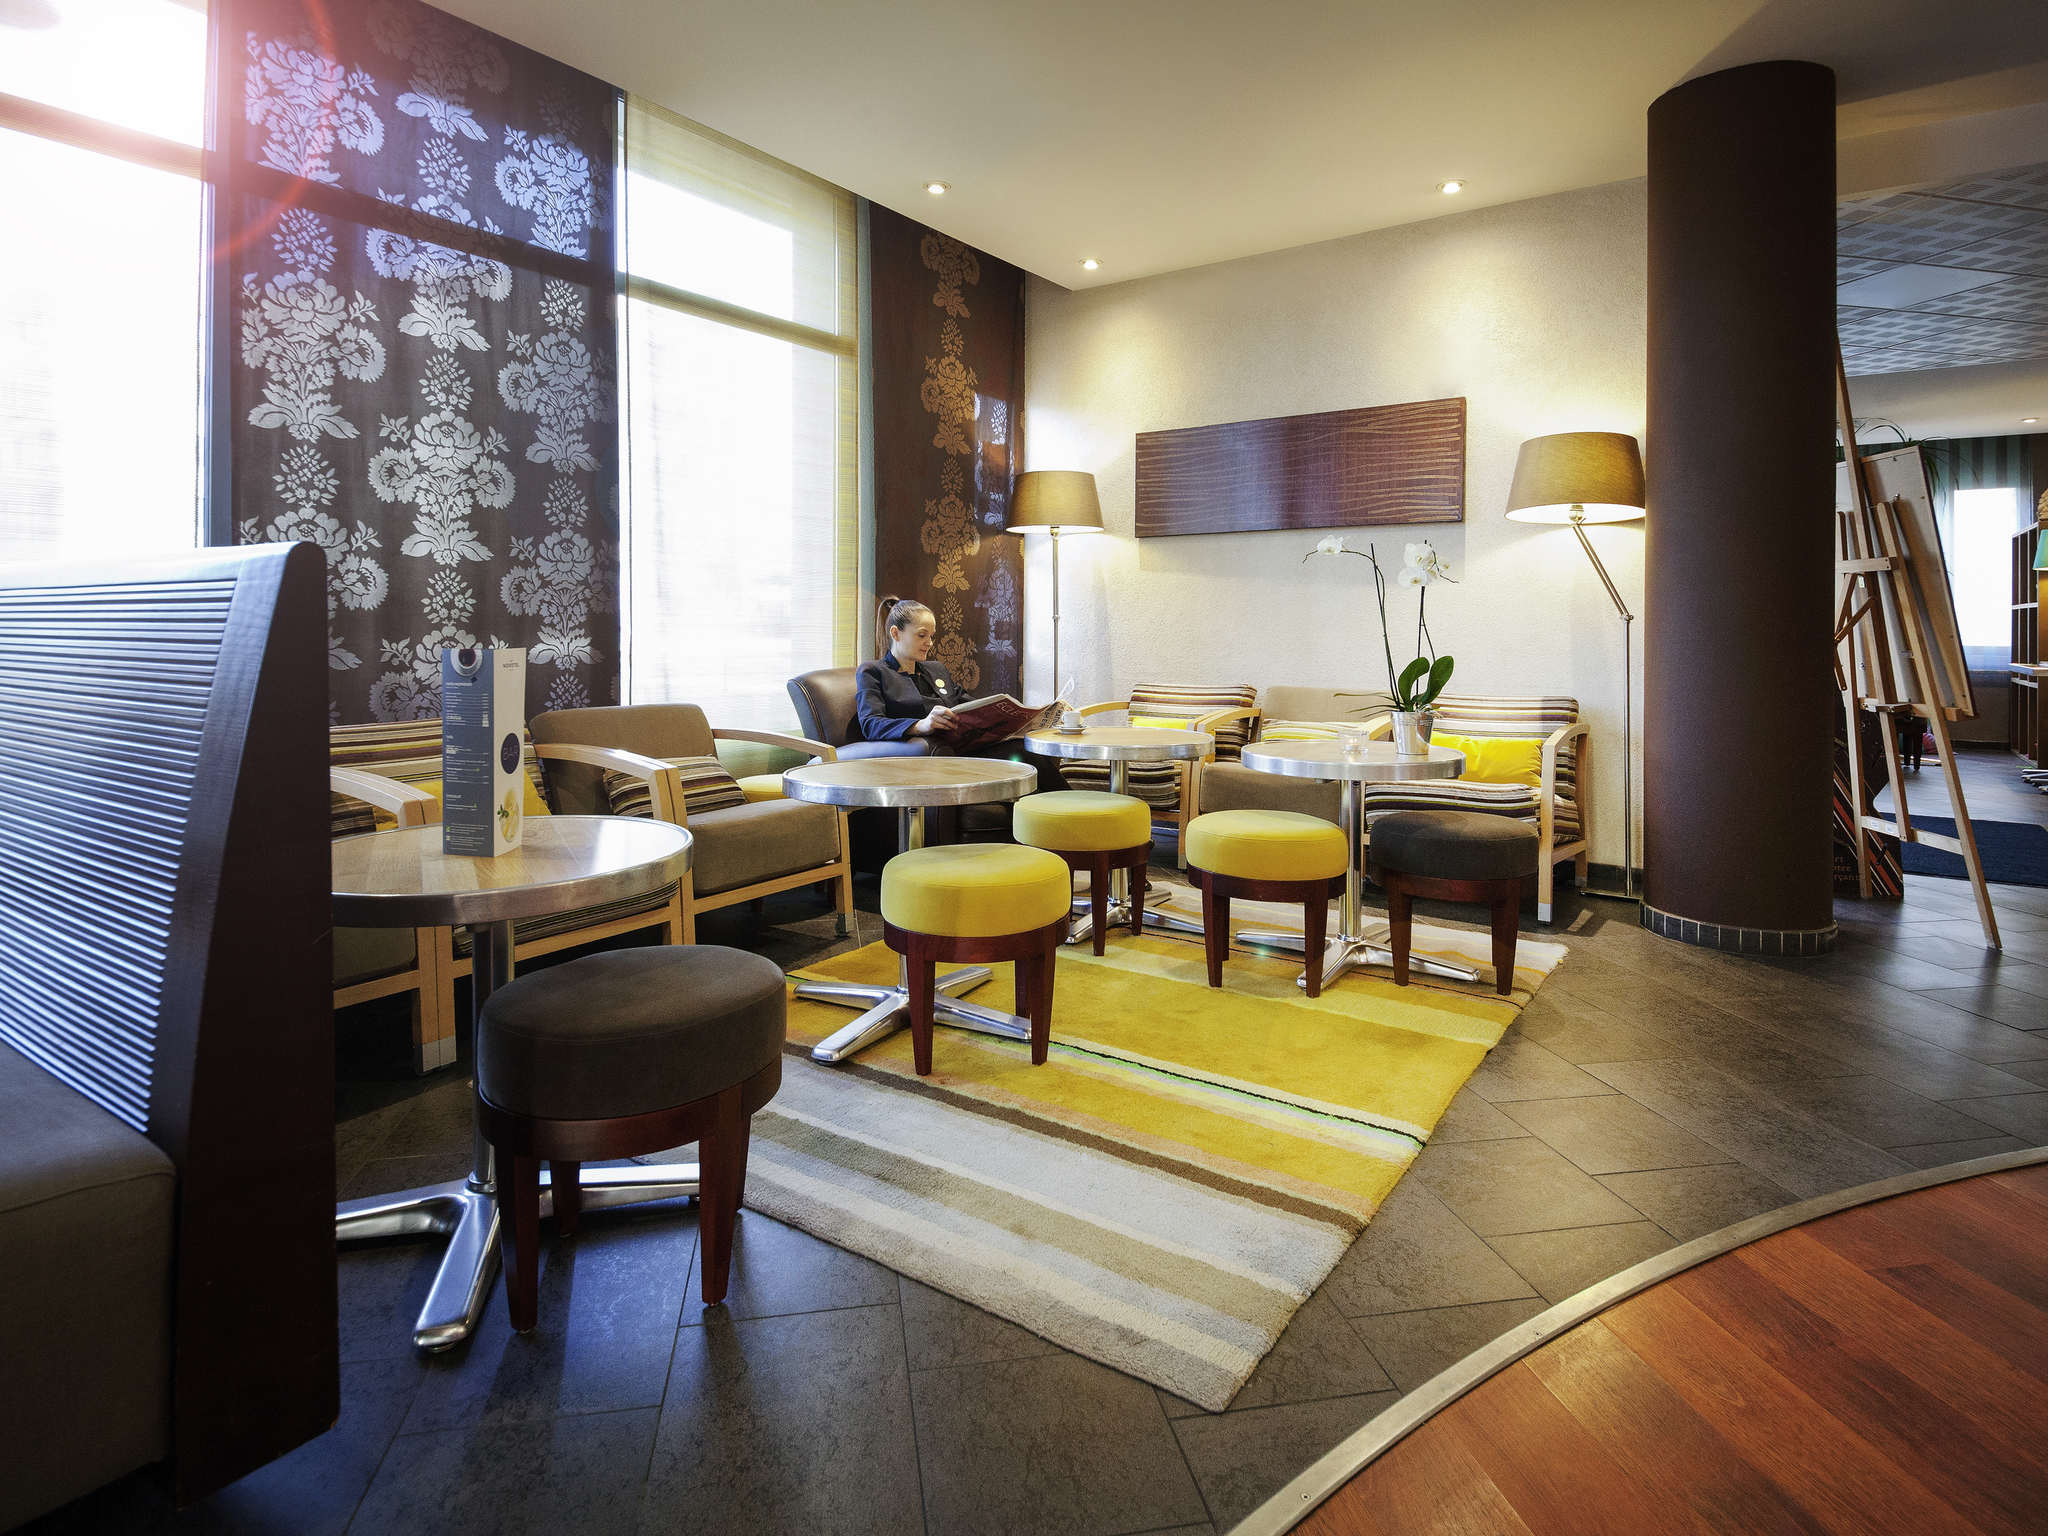 Hotel - Novotel Suites Clermont Ferrand Polydome